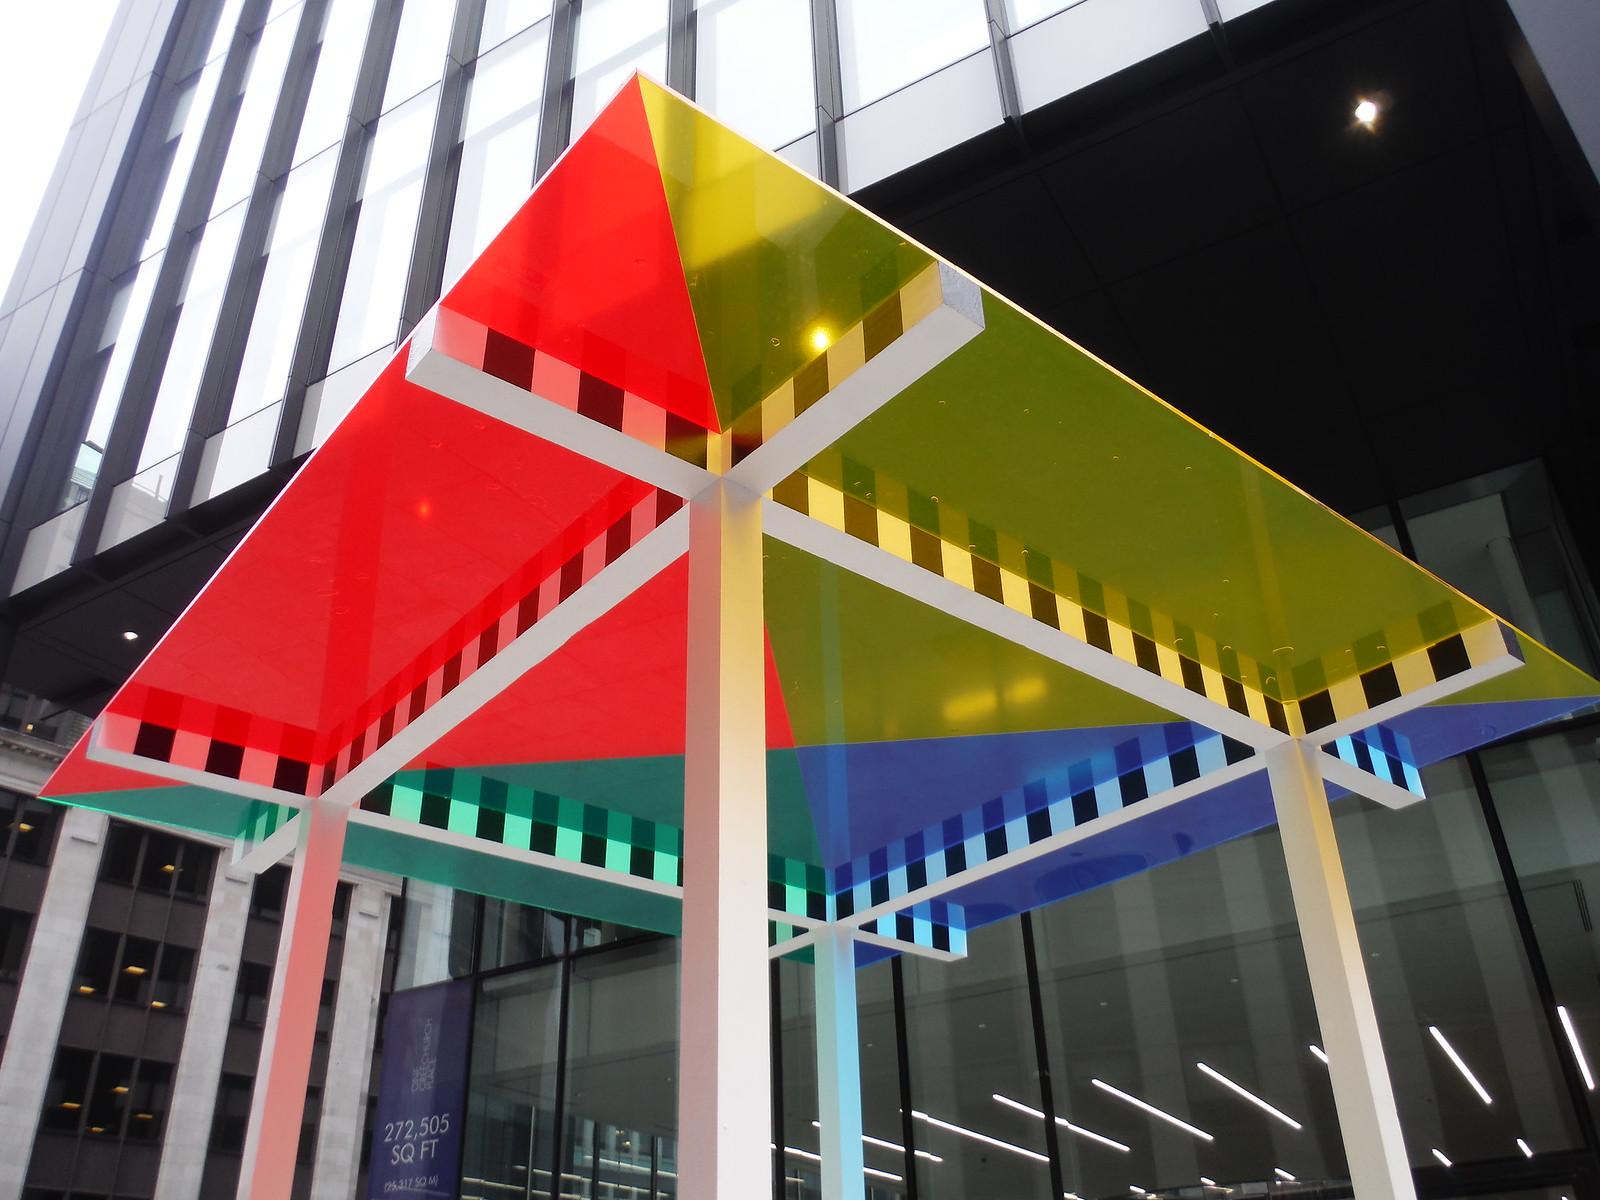 Daniel Buren - 4 Colours at 3 Meters High Situated Work SWC Walk Short 24 - Sculpture in the City